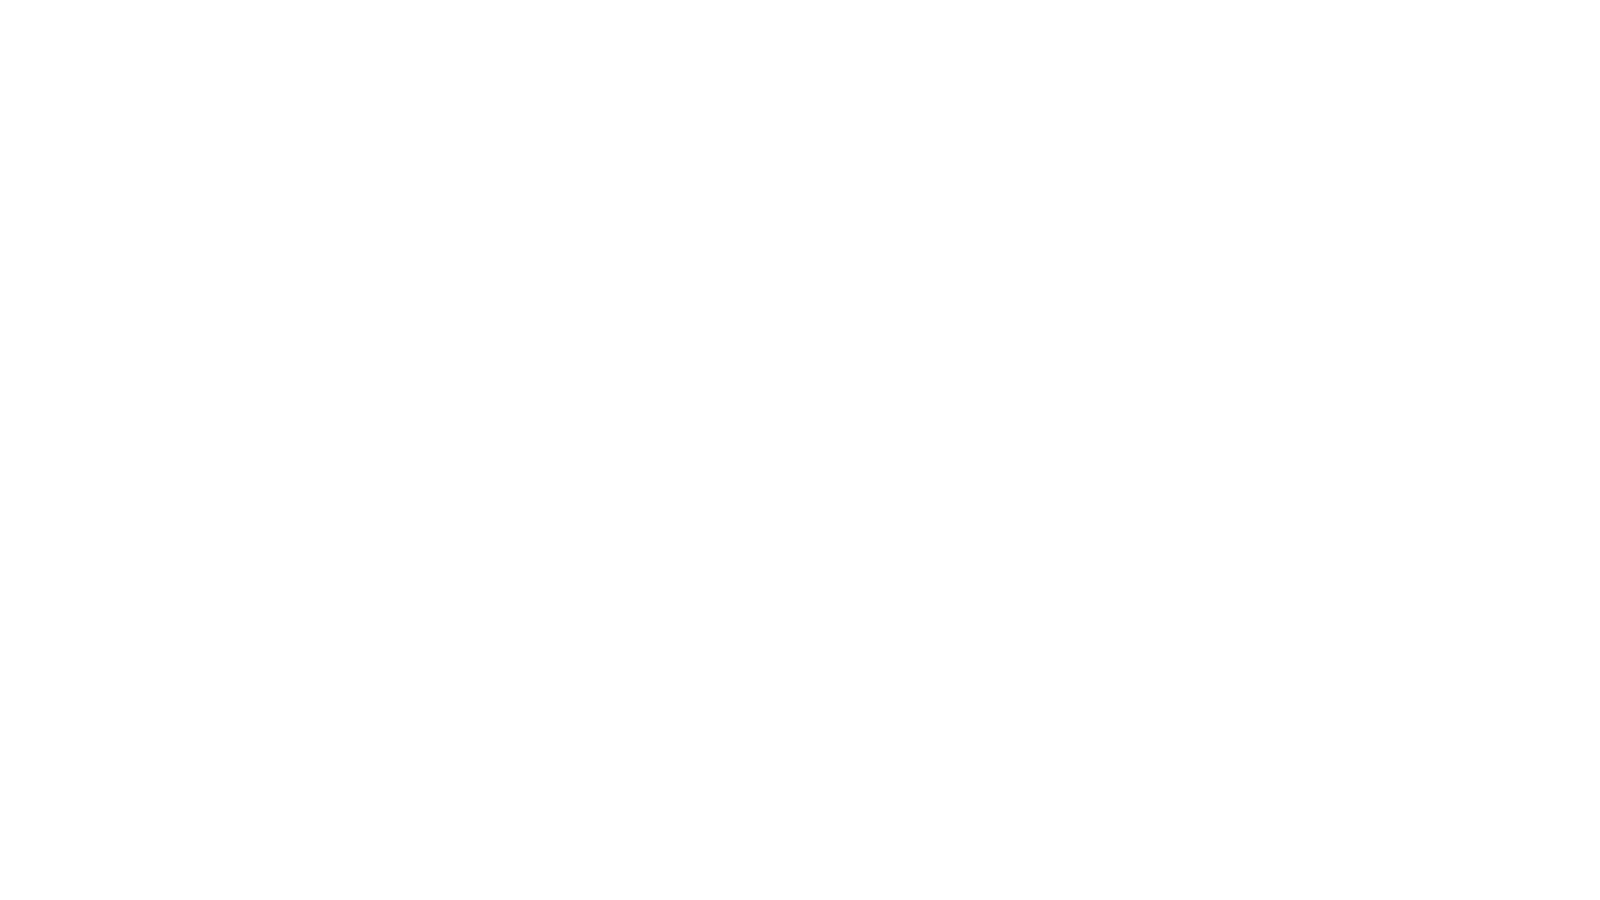 Blog: https://www.frankys-reisen.de Instagramm: https://www.instagram.com/frankythereal/ Twitter:  https://twitter.com/frankythereal  Wenn Du eine Yamaha Tenere 700 / XTZ 690 haben möchtest //////////////////////////////////////////// https://suchen.mobile.de/motorrad/yamaha-tenere.html  Meine Ausstattung:  ================  Aufnahmetechnik: - Motorradkamera == https://amzn.to/2Ik7lKn - Fotokamera == https://amzn.to/2V3353i - Stativ == https://amzn.to/2IjHBh6  Schnitttechnik: ============ - Mein Schnittprogramm == https://amzn.to/2Hi0BLv  ---------------------------------------------------------------------------------------------------- Video:  Yamaha Promovideo  https://www.youtube.com/watch?v=uy55wM0q9r0  Musik:  RUN by Till @tillbeats Music provided by Free Music for Vlogs youtu.be/iUqPwSCJXUc  ------------------------------  • Contact the artist:  @tillbeats www.instagram.com/tillack_/ till.beats1@gmail.com  ------------------------------  Free Music for Vlogs  This Youtube Channel is dedicated to search, catalog, sort and publish free music for vlogs and videos destined to content creators and filmmakers.